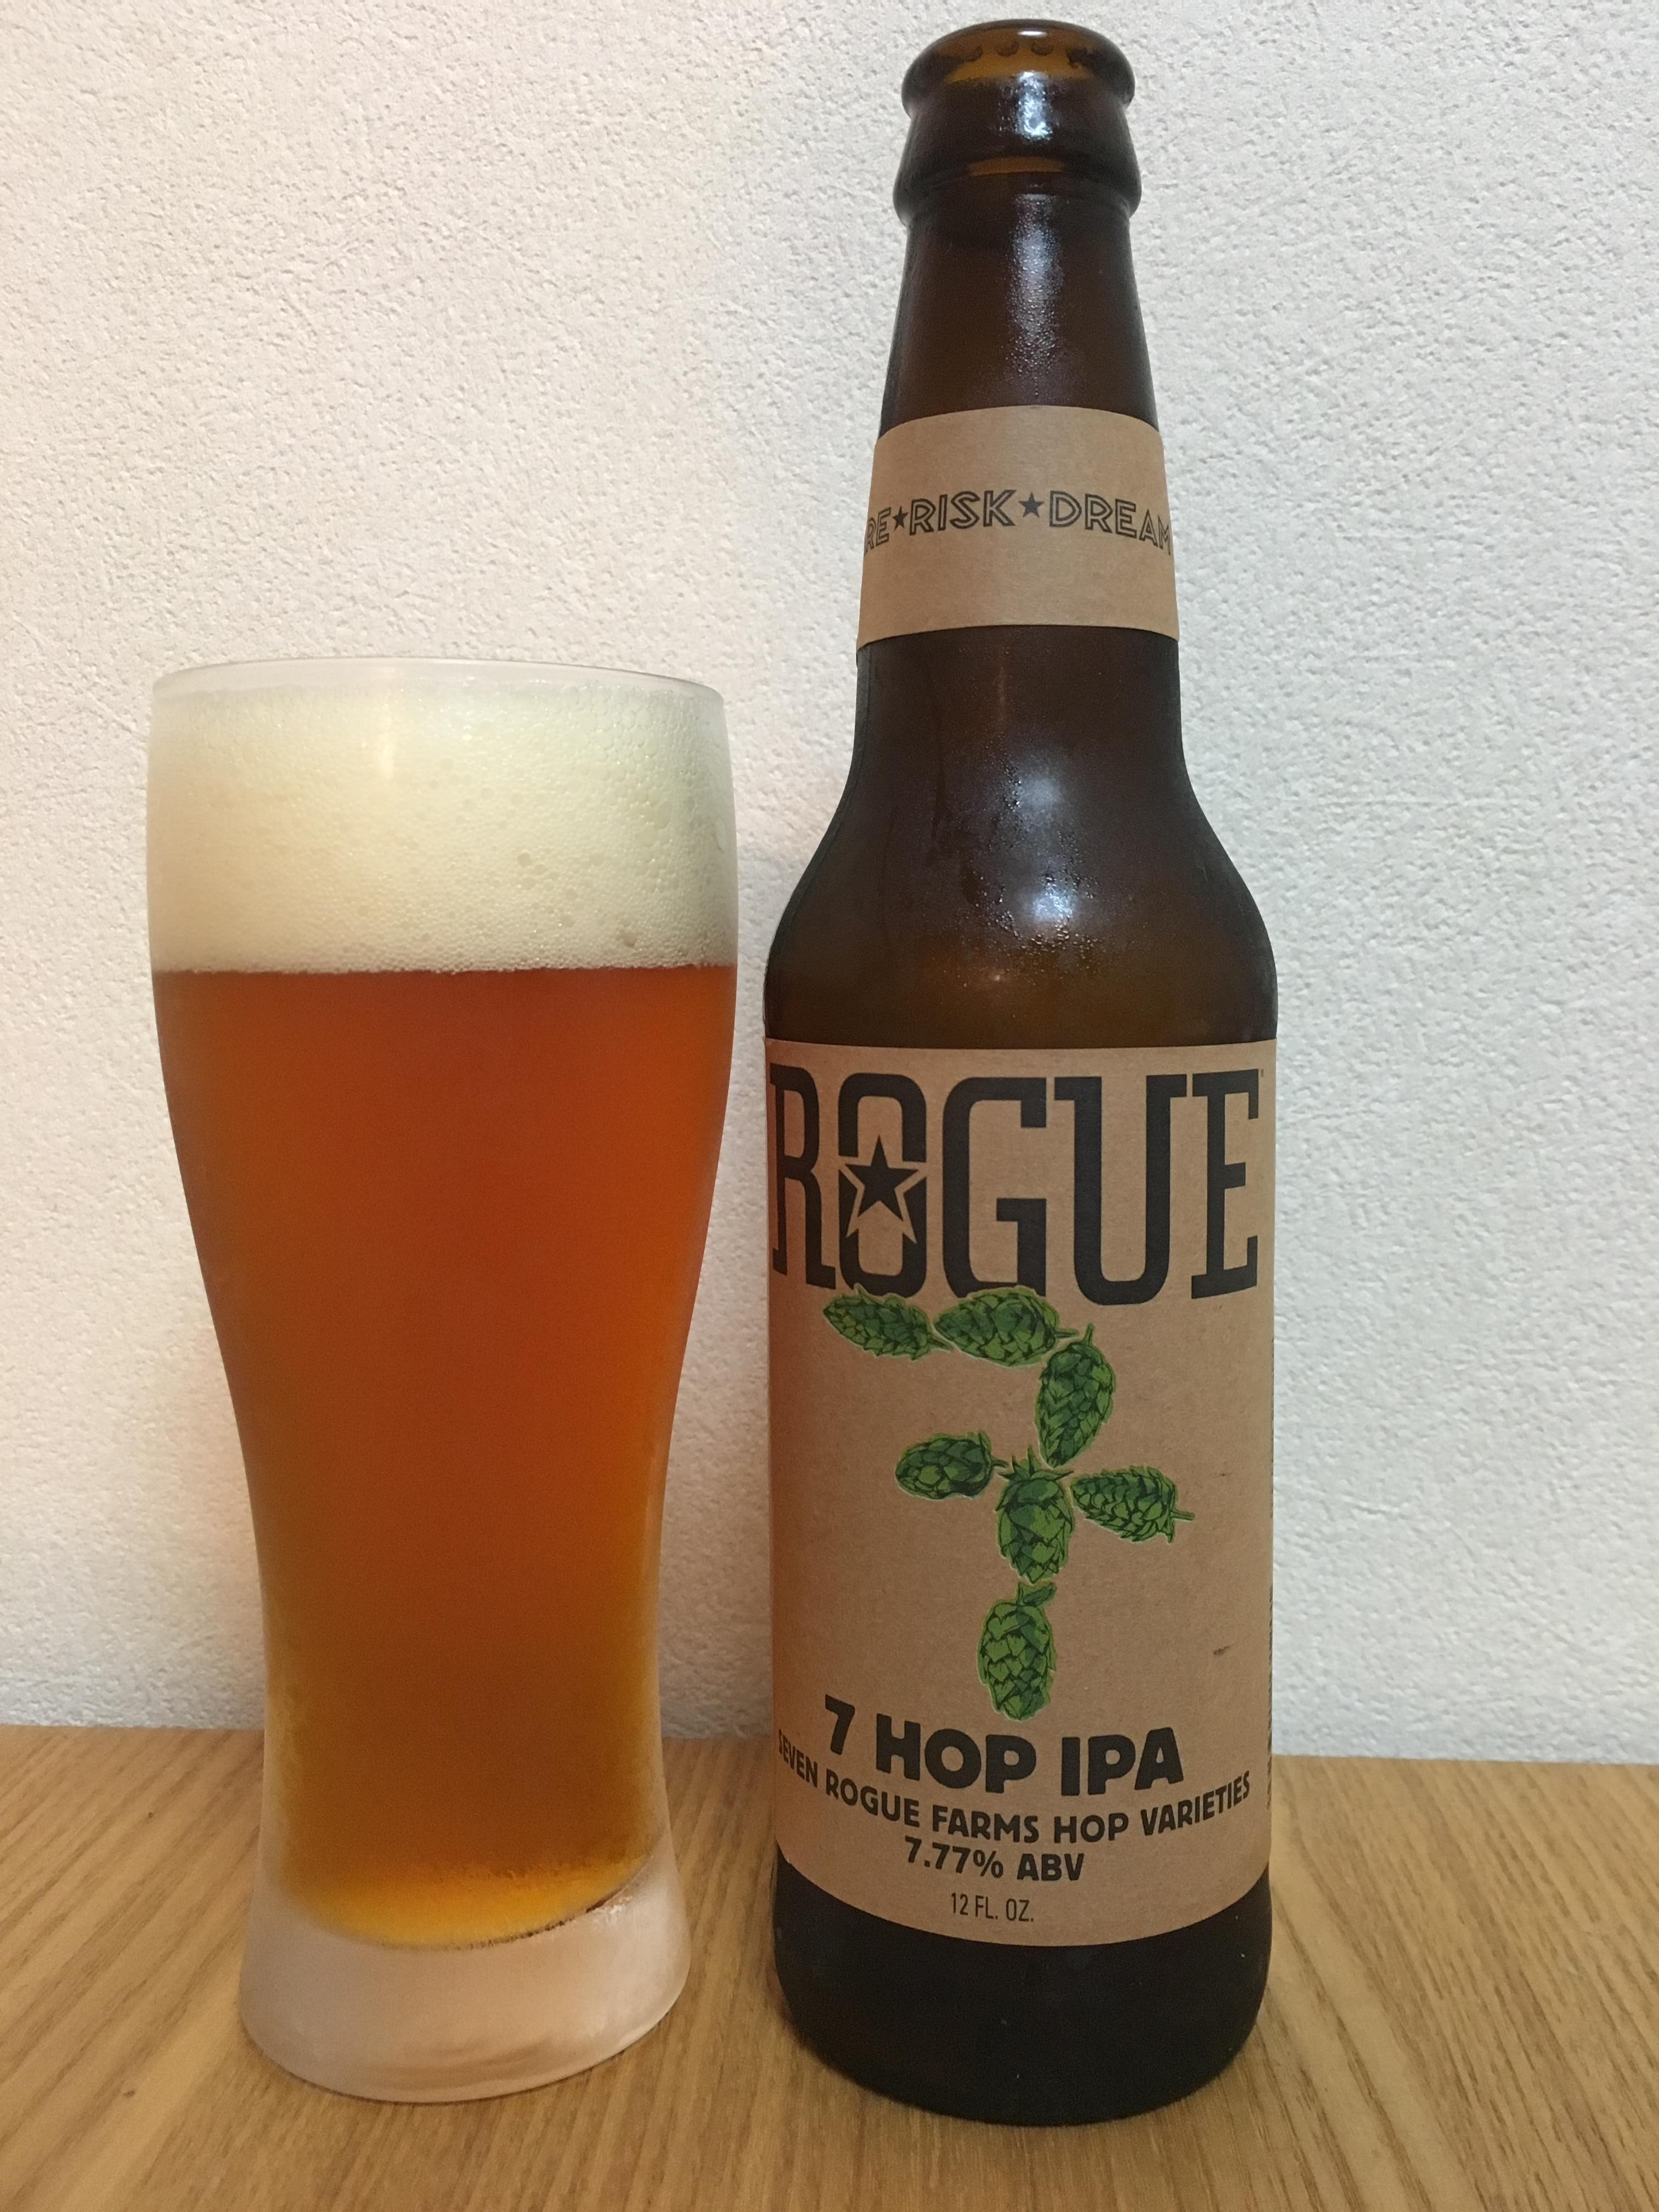 ROGUE 7 HOP IPA(ローグ 7 ホップ IPA)